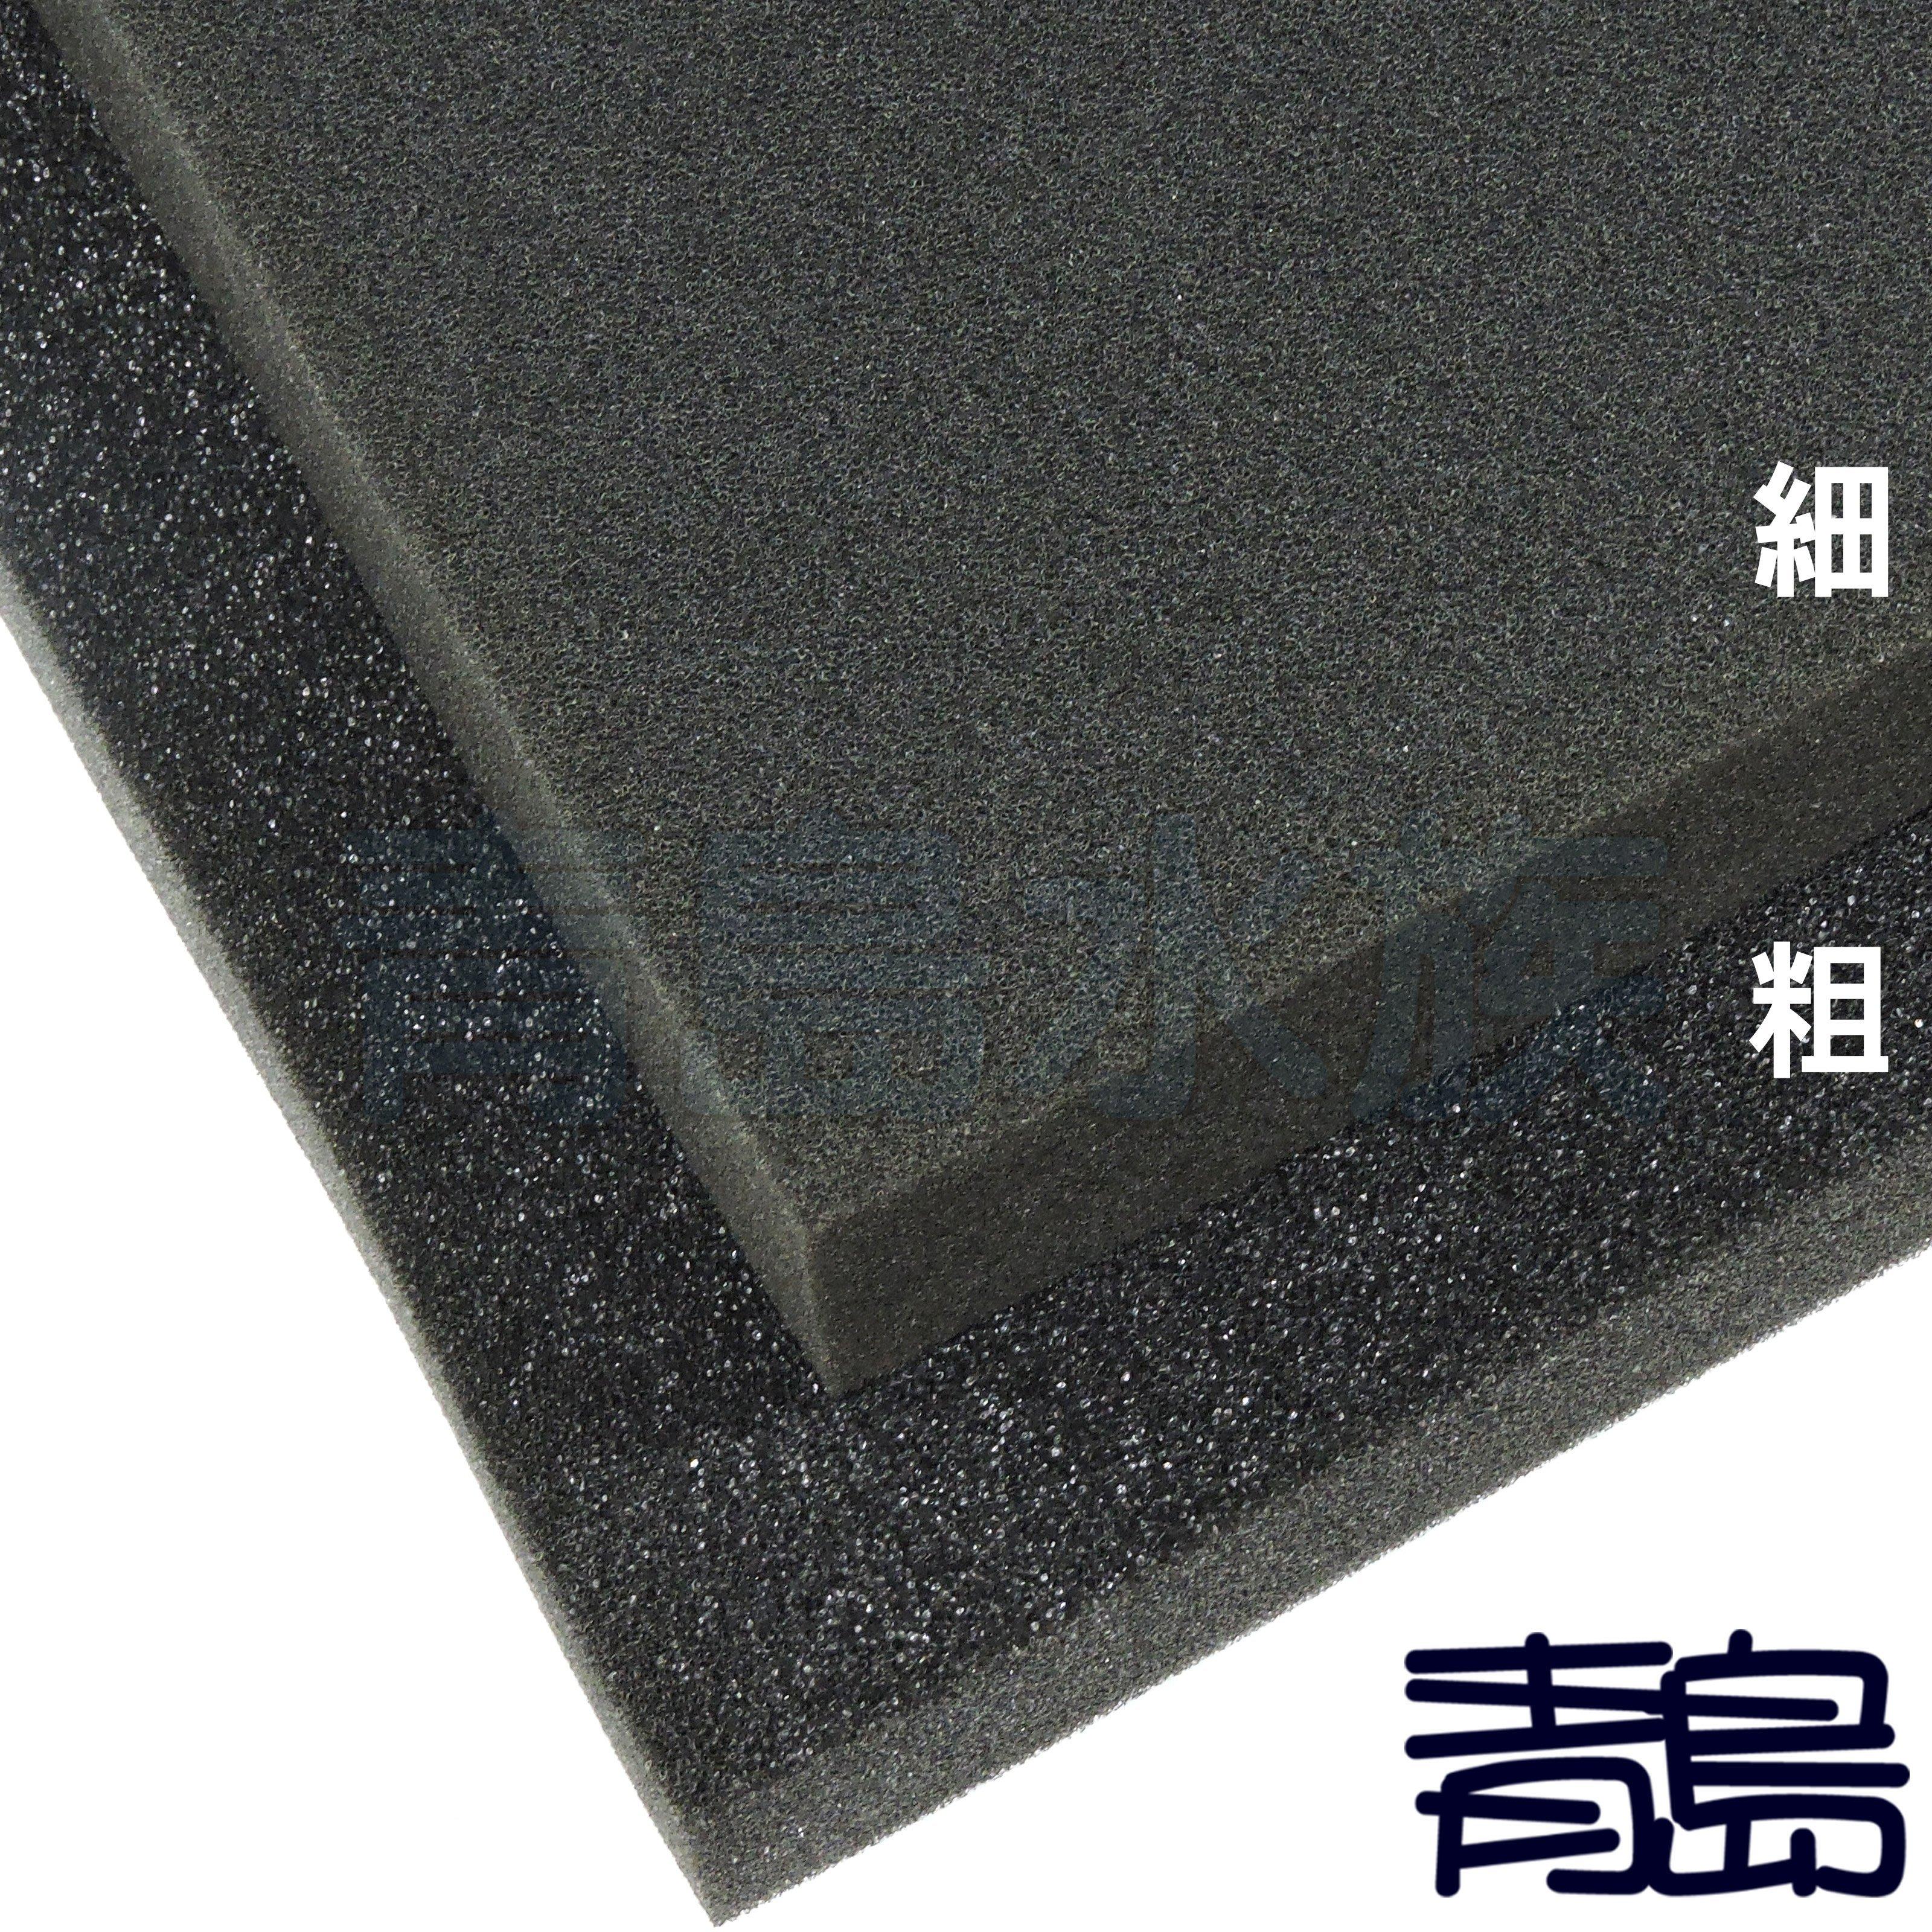 Y。。。青島水族。。。F-4545-15F高品質生化棉/四方黑色==細45cm*45cm*15cm 買5送1